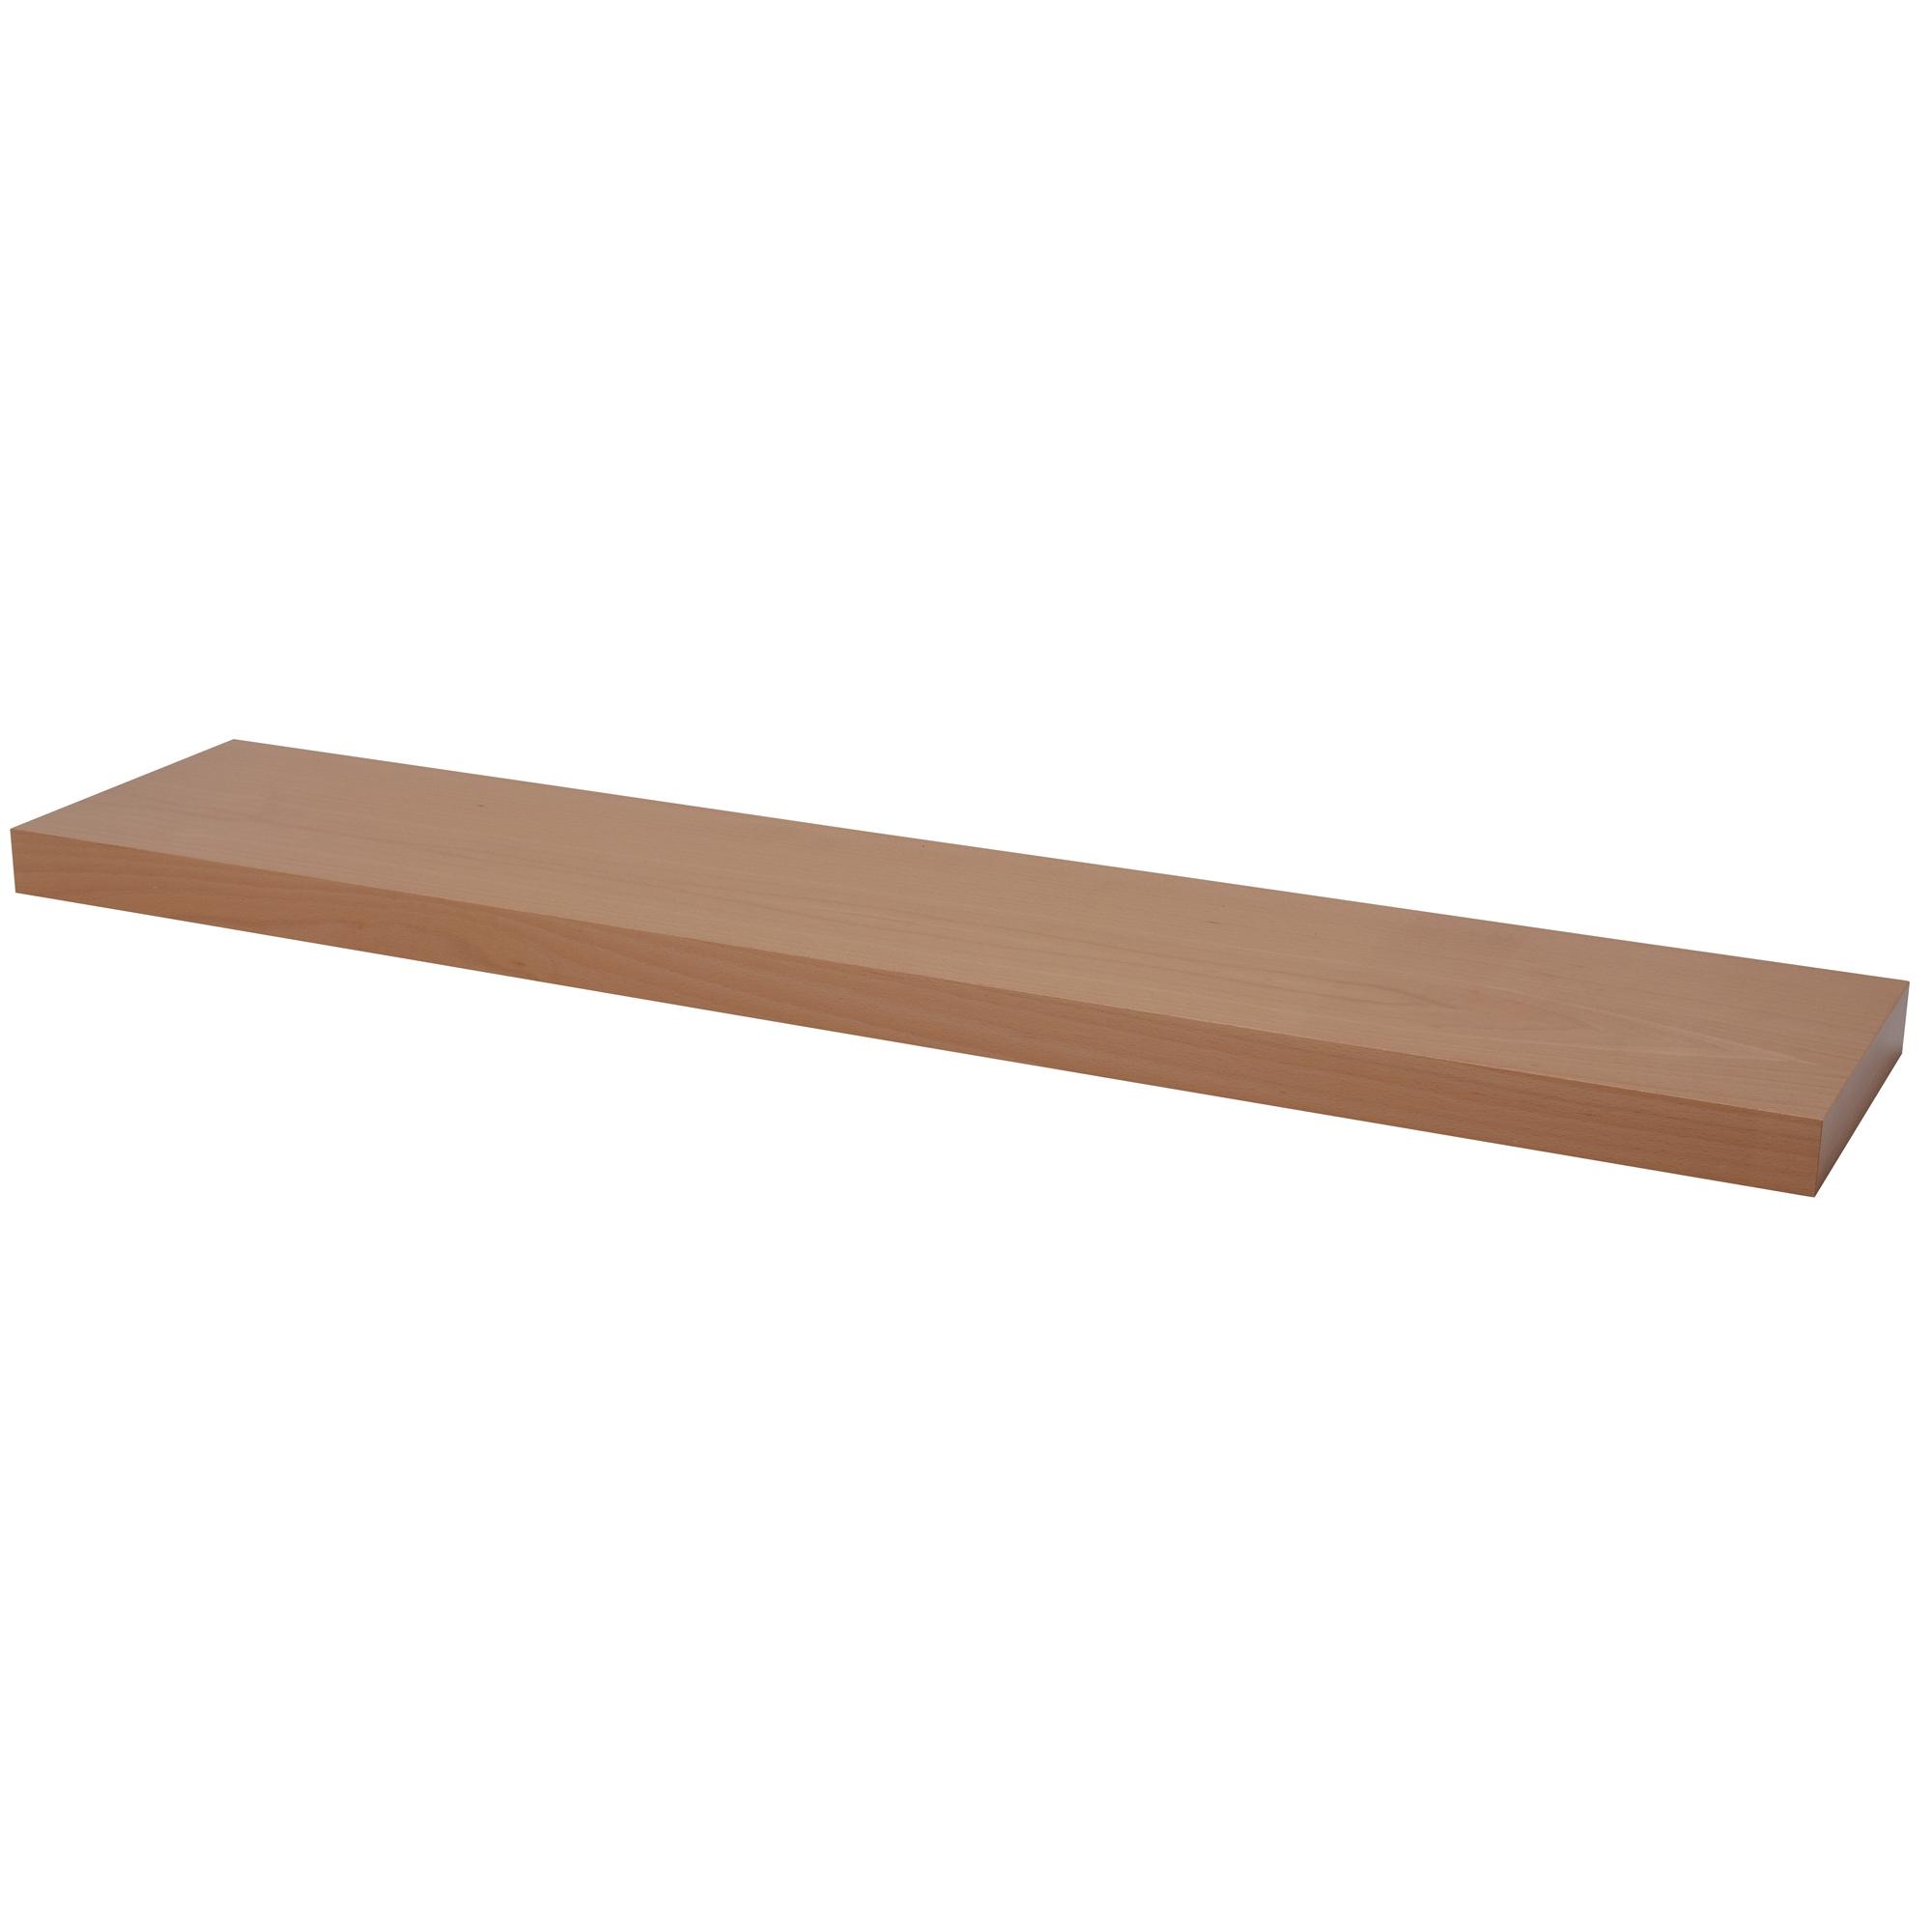 Floating Shelf Beech Veneer 120cm Pekodom Within Floating Shelves 120cm (#4 of 12)